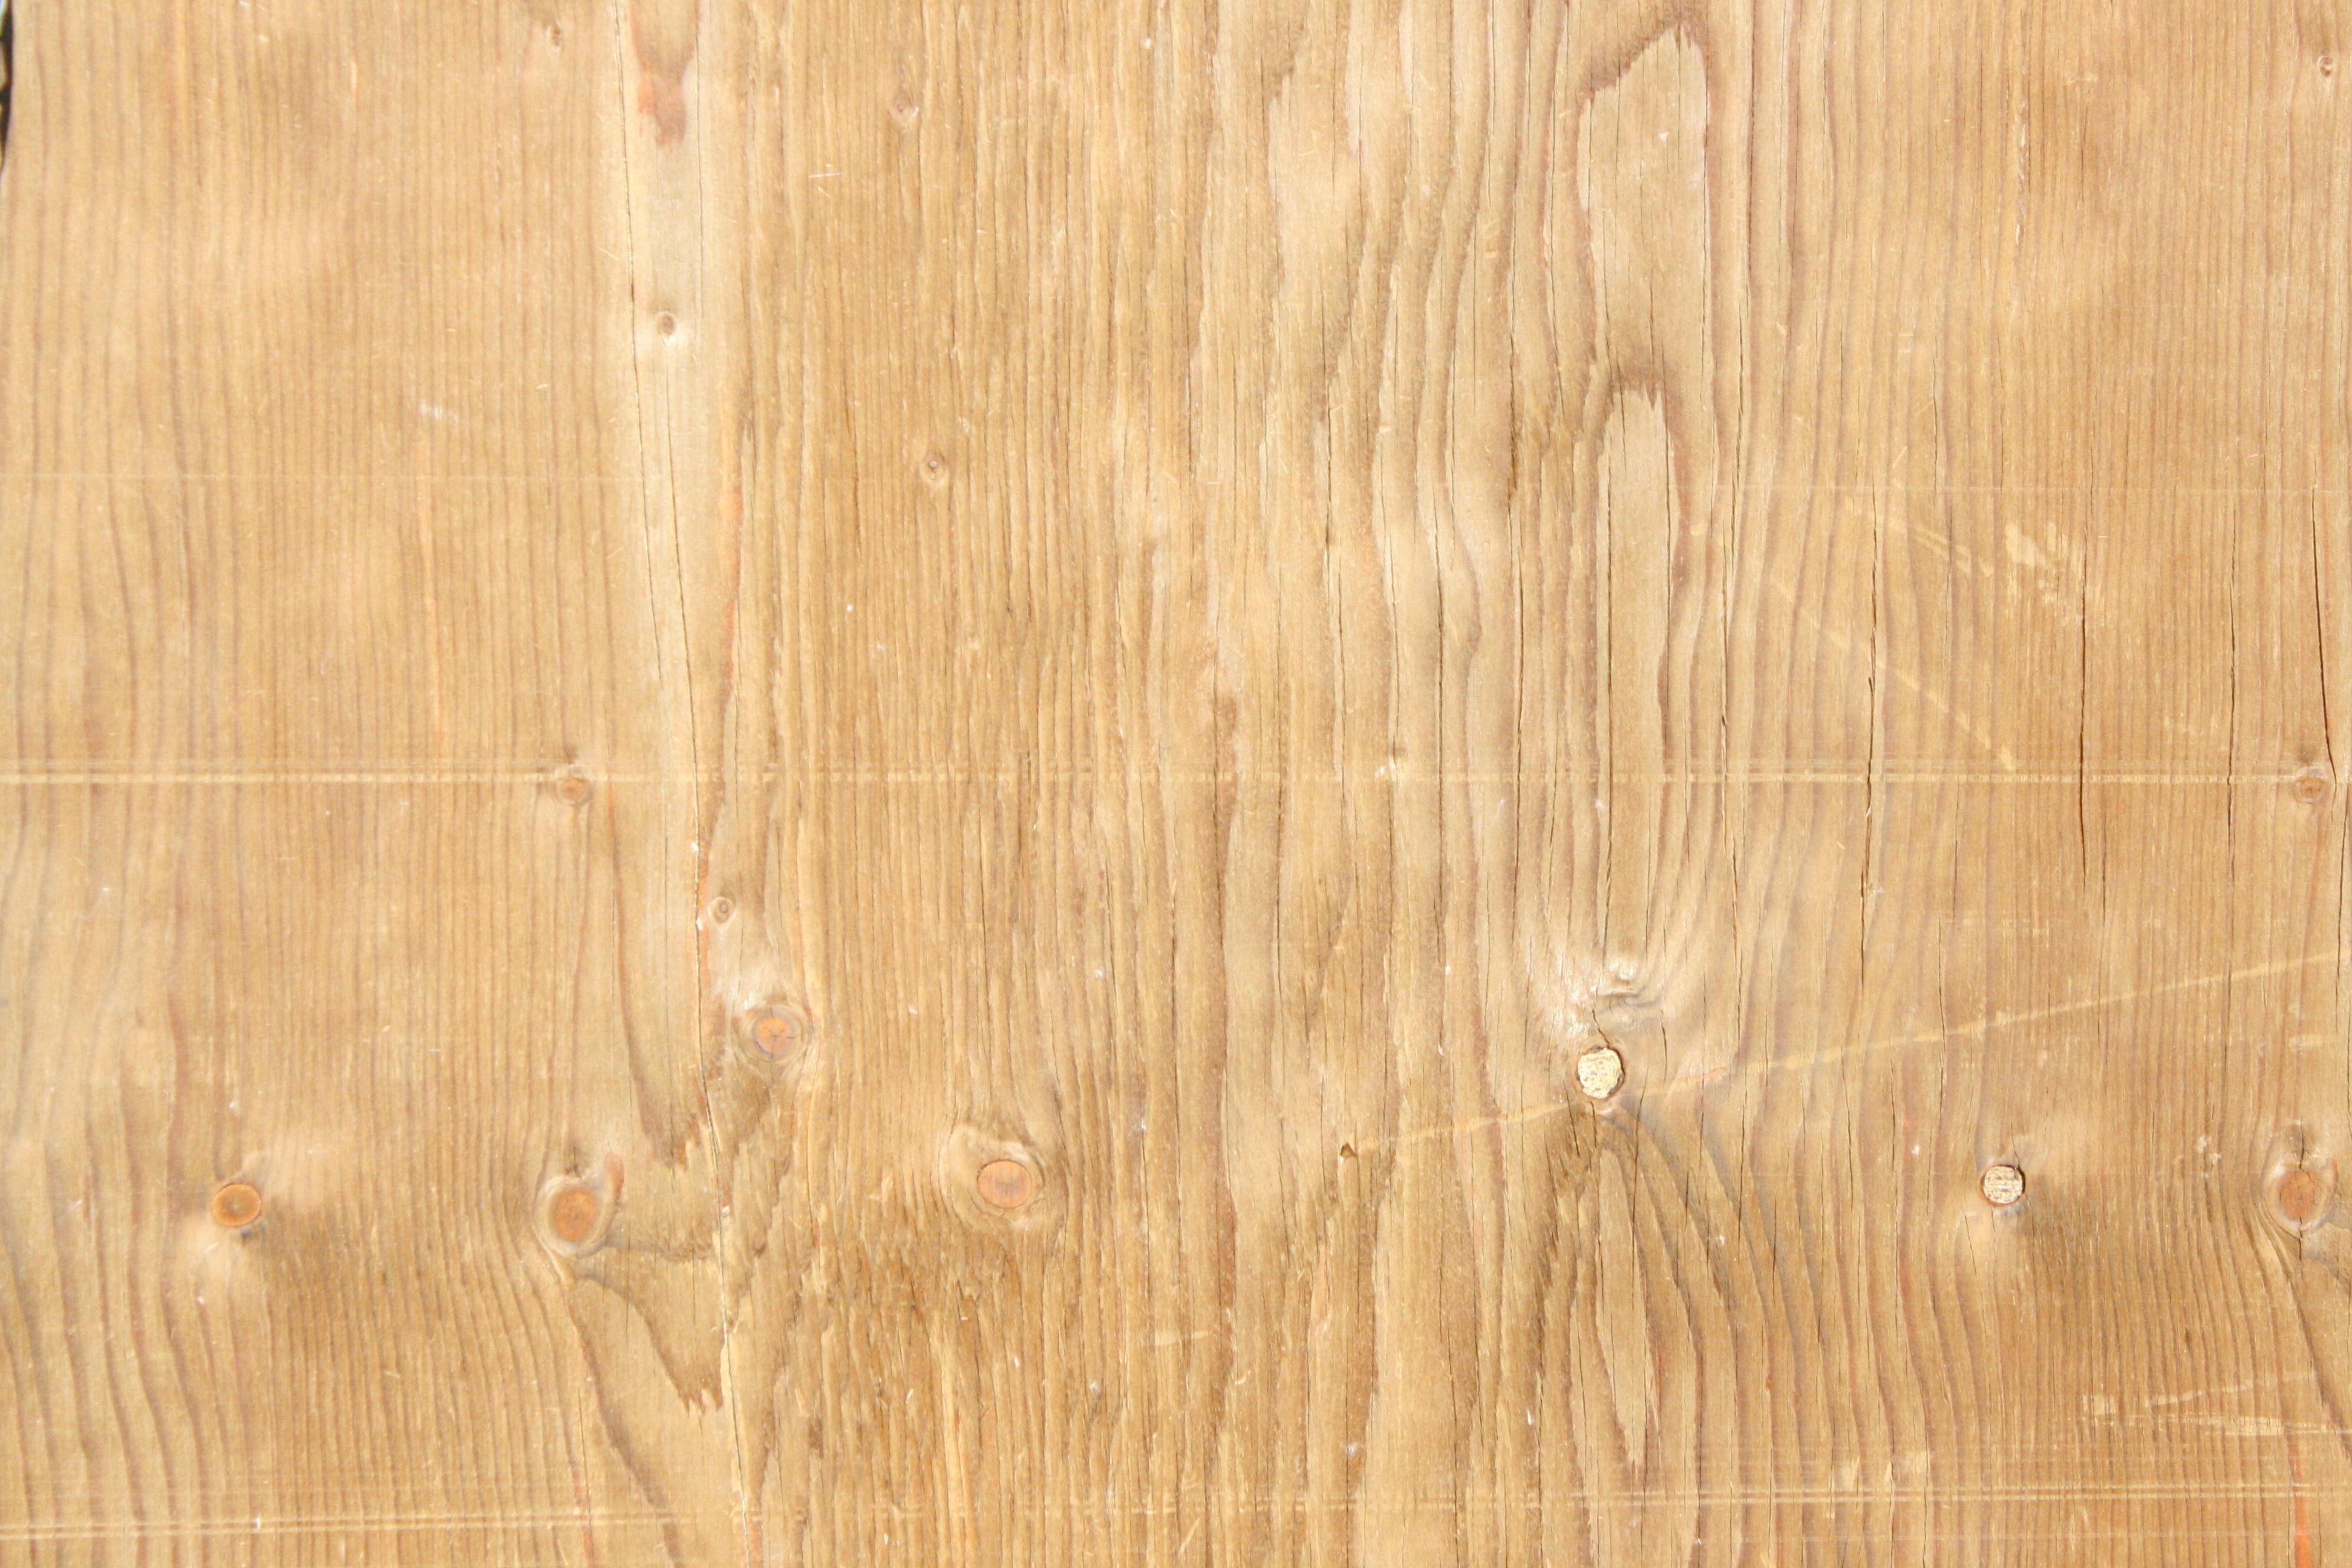 3d wooden texture pack cgtrader wooden texture pack 3d model 1 altavistaventures Gallery